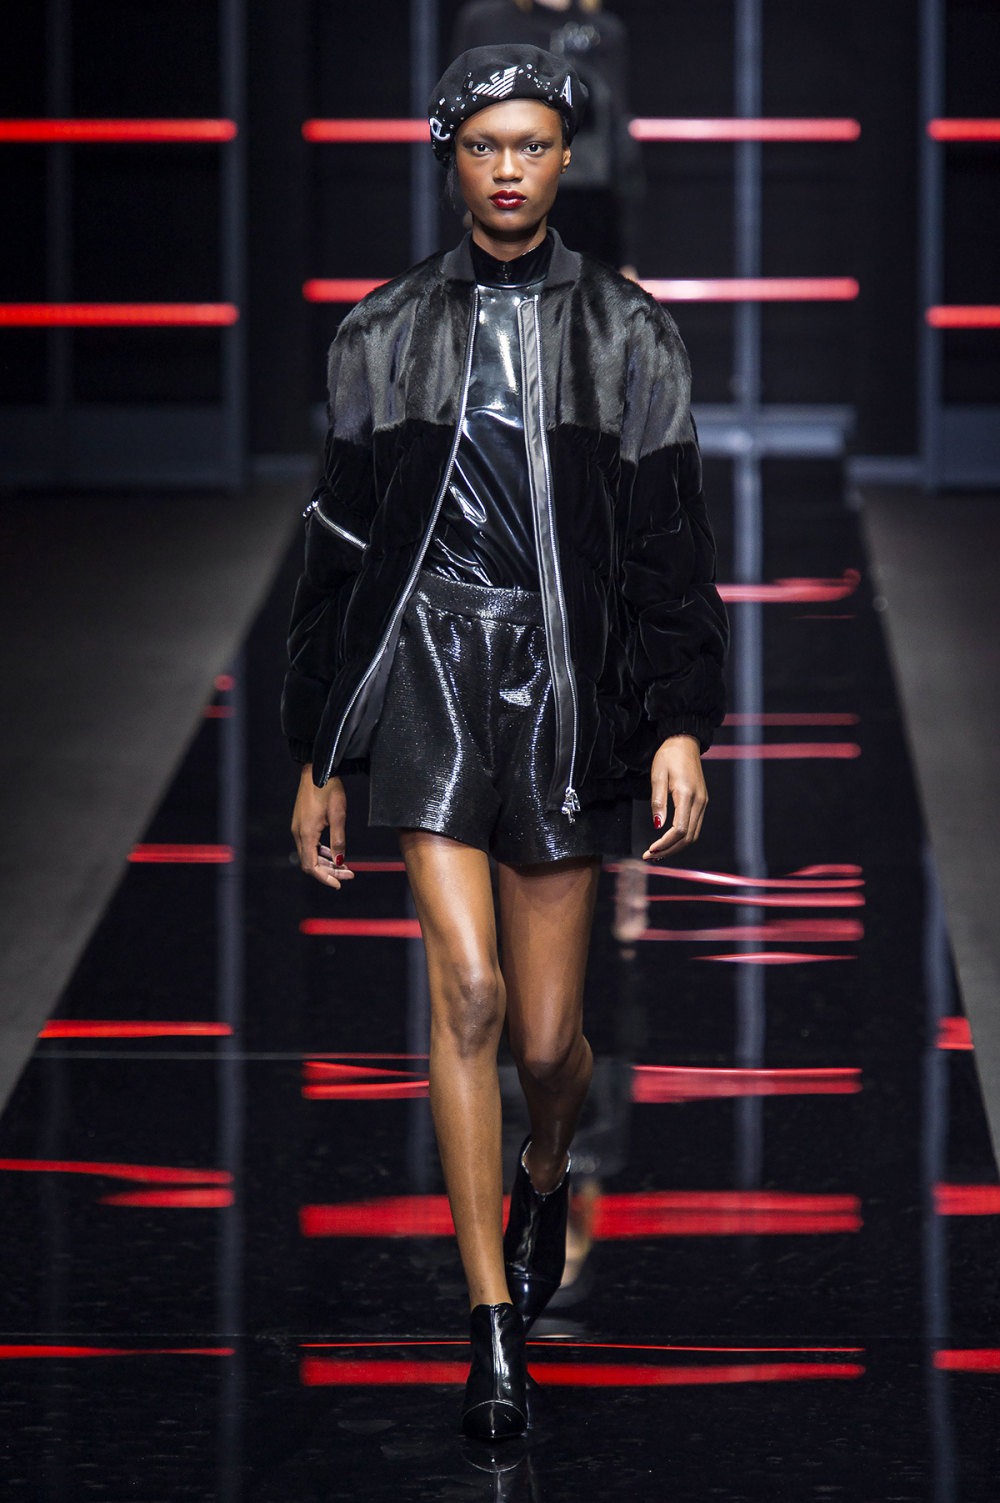 Emporio Armani时装系列畅的裤子带有柔滑裙子的鸡尾酒礼服-35.jpg